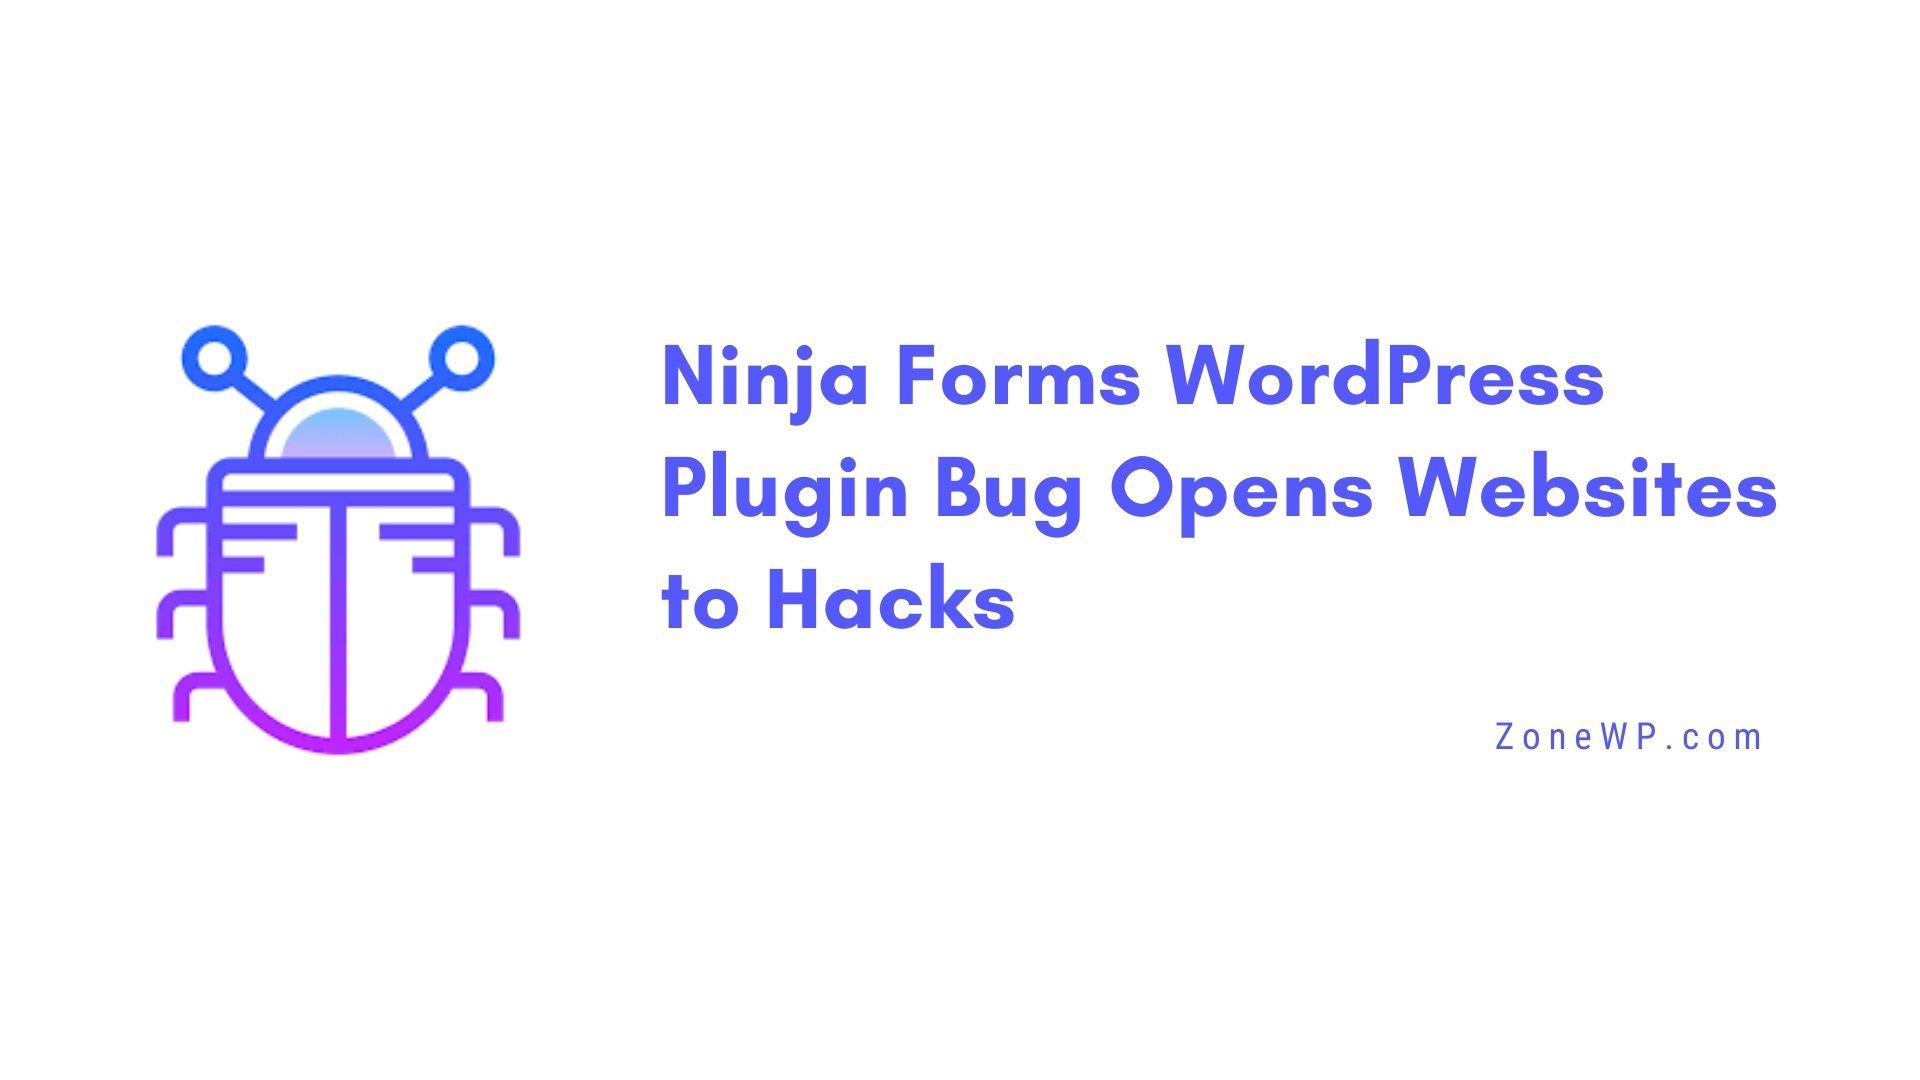 Ninja Forms WordPress Plugin Bug Opens Websites to Hacks